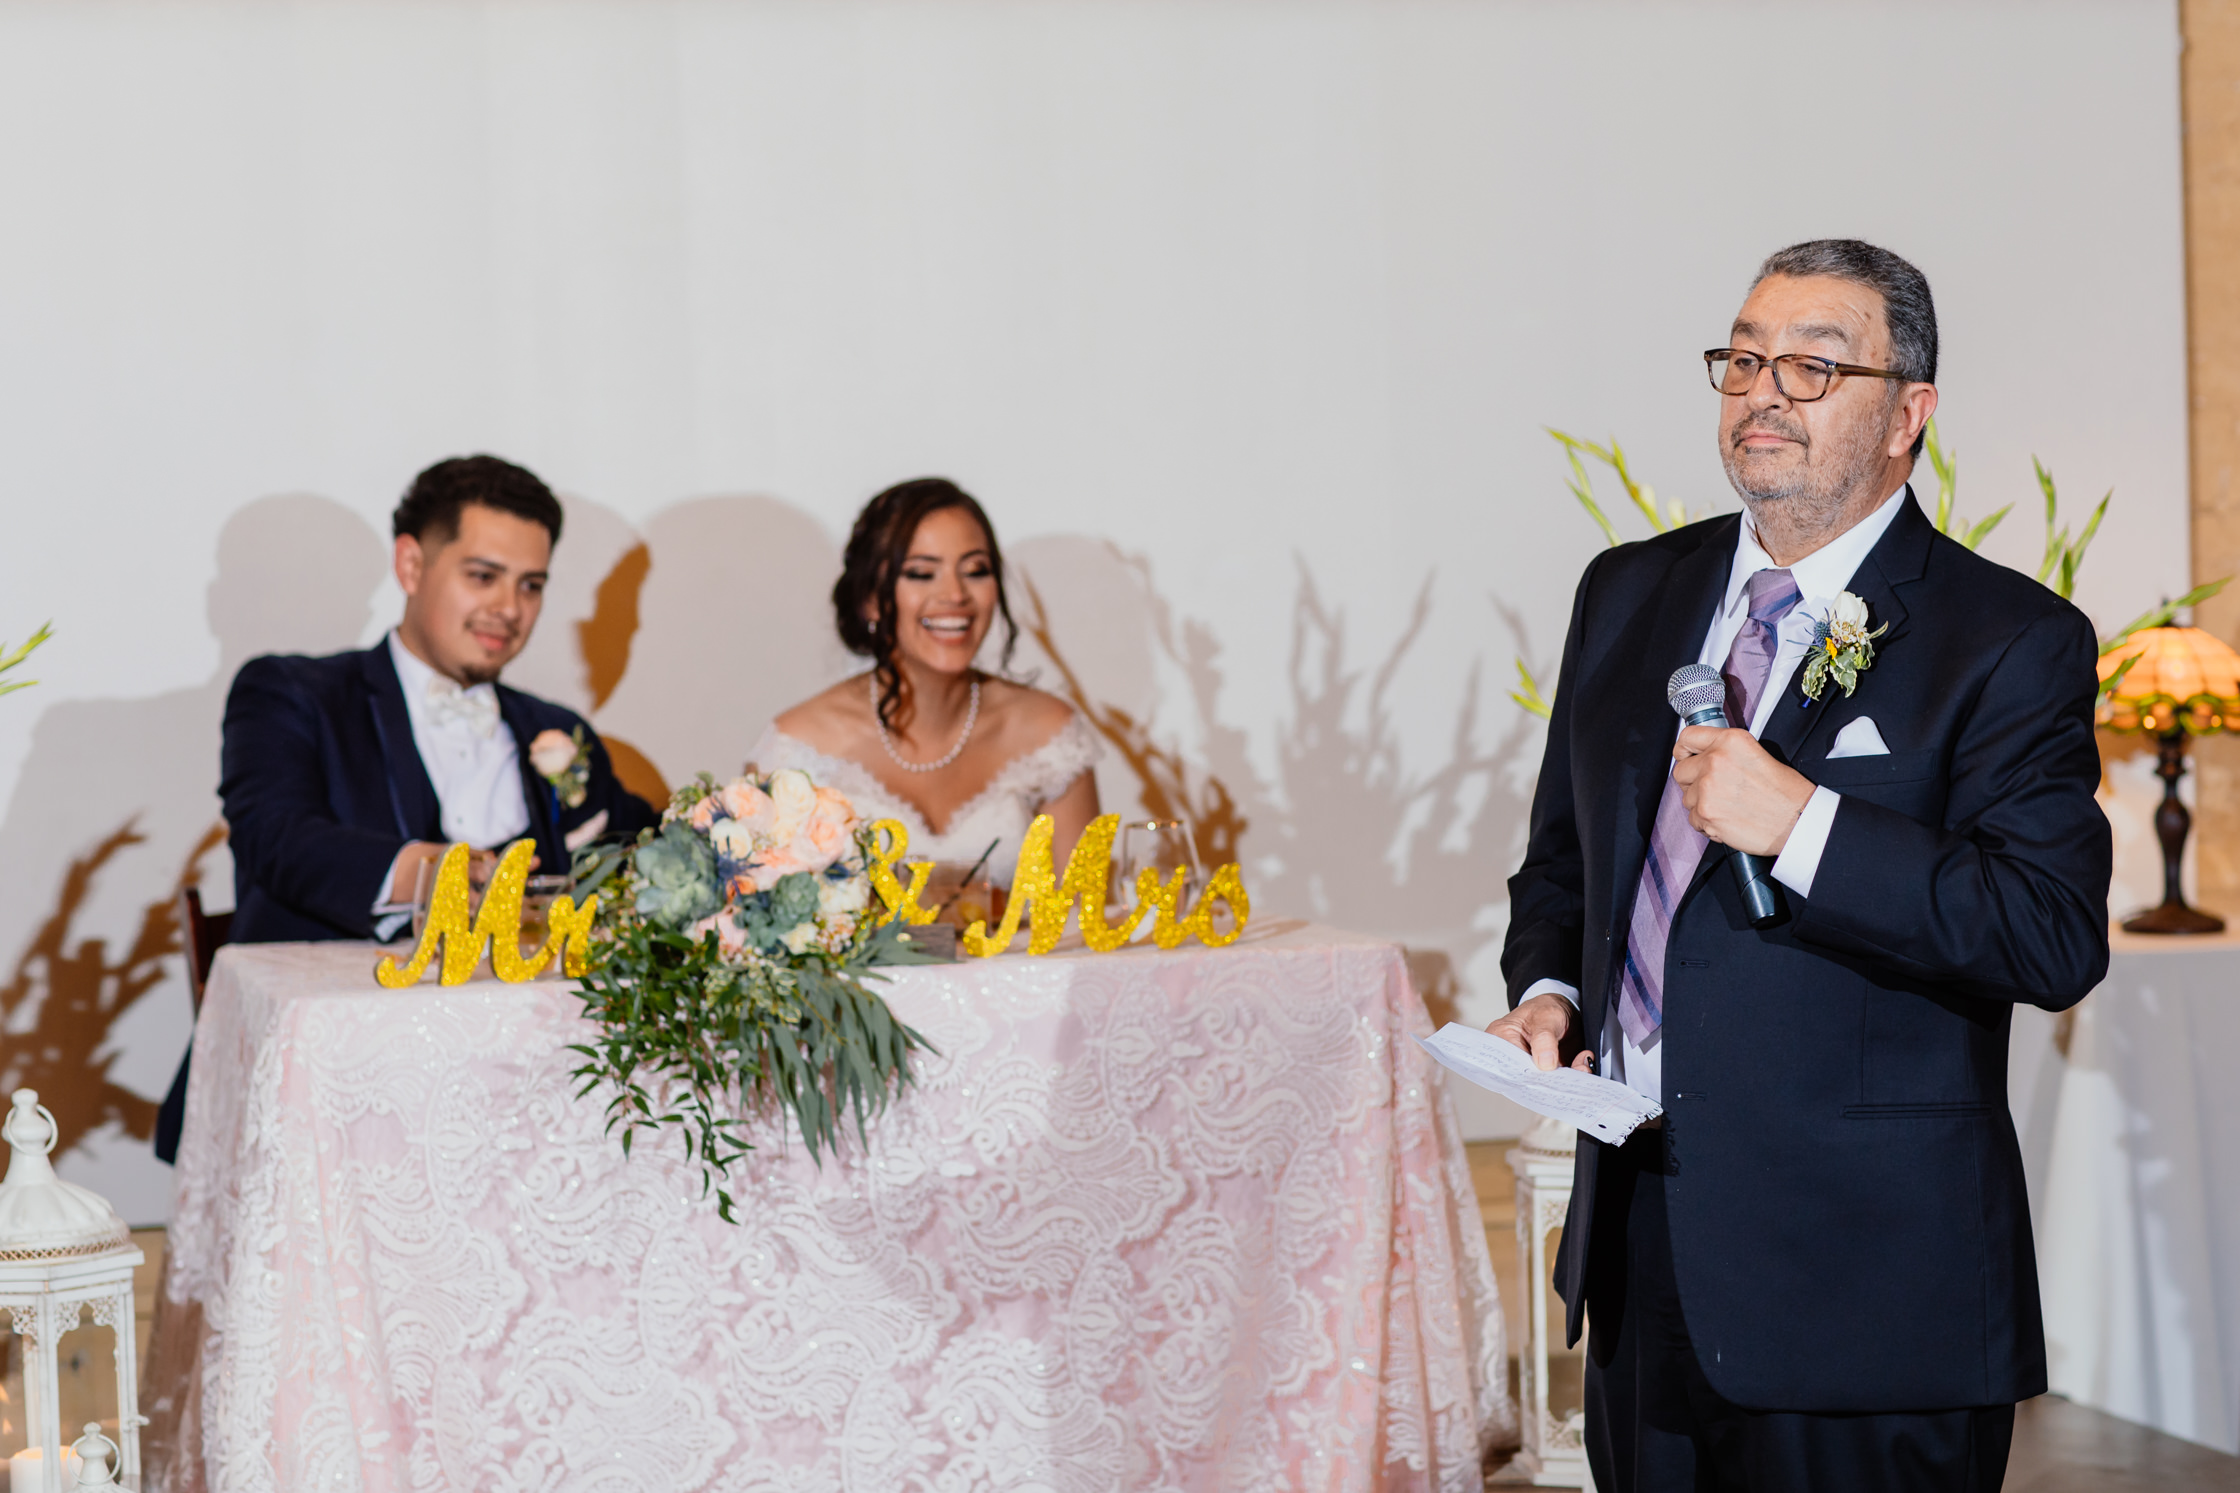 luis_joanna_wedding-89.jpg